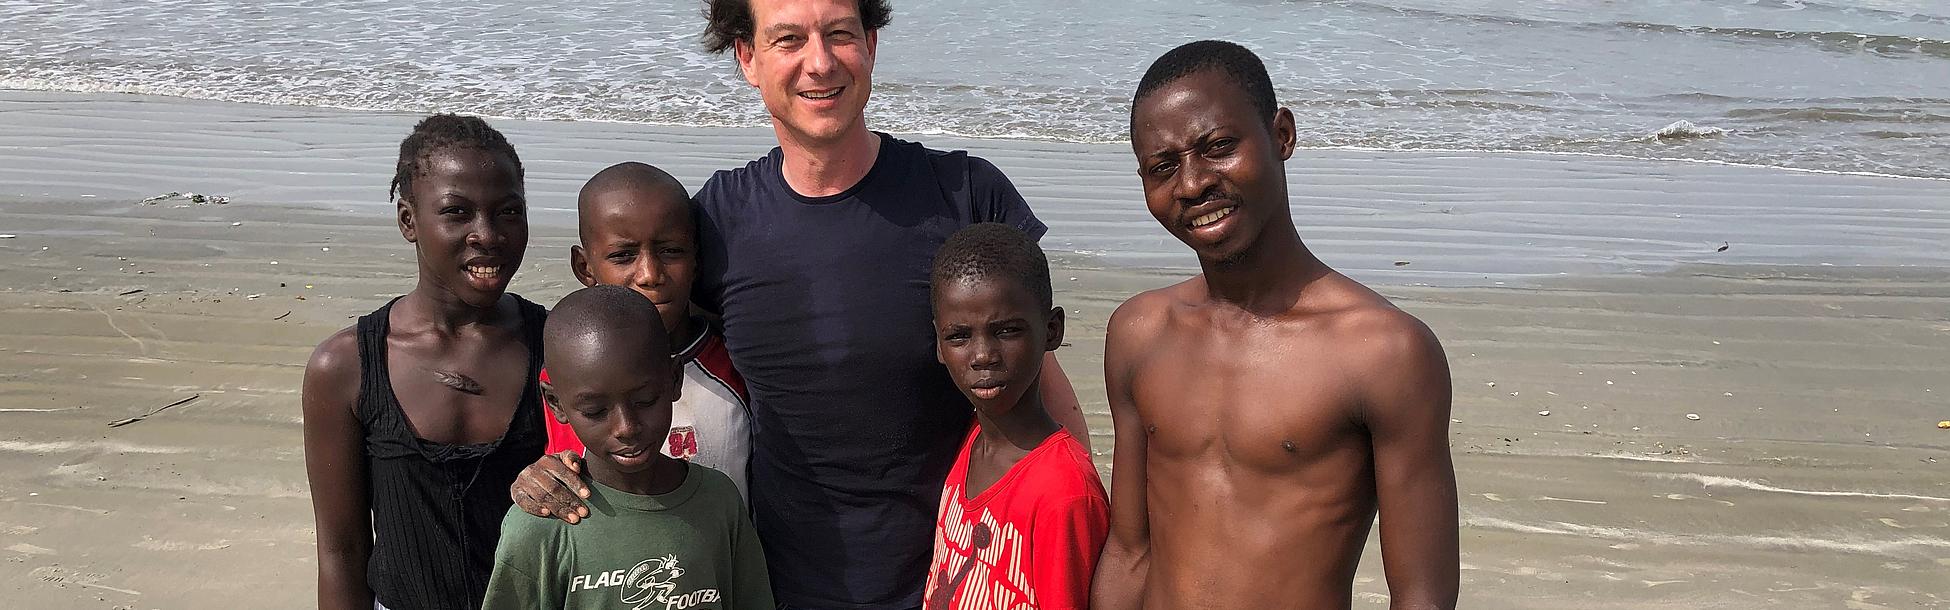 Umweltschutz Gambia Kopfbild